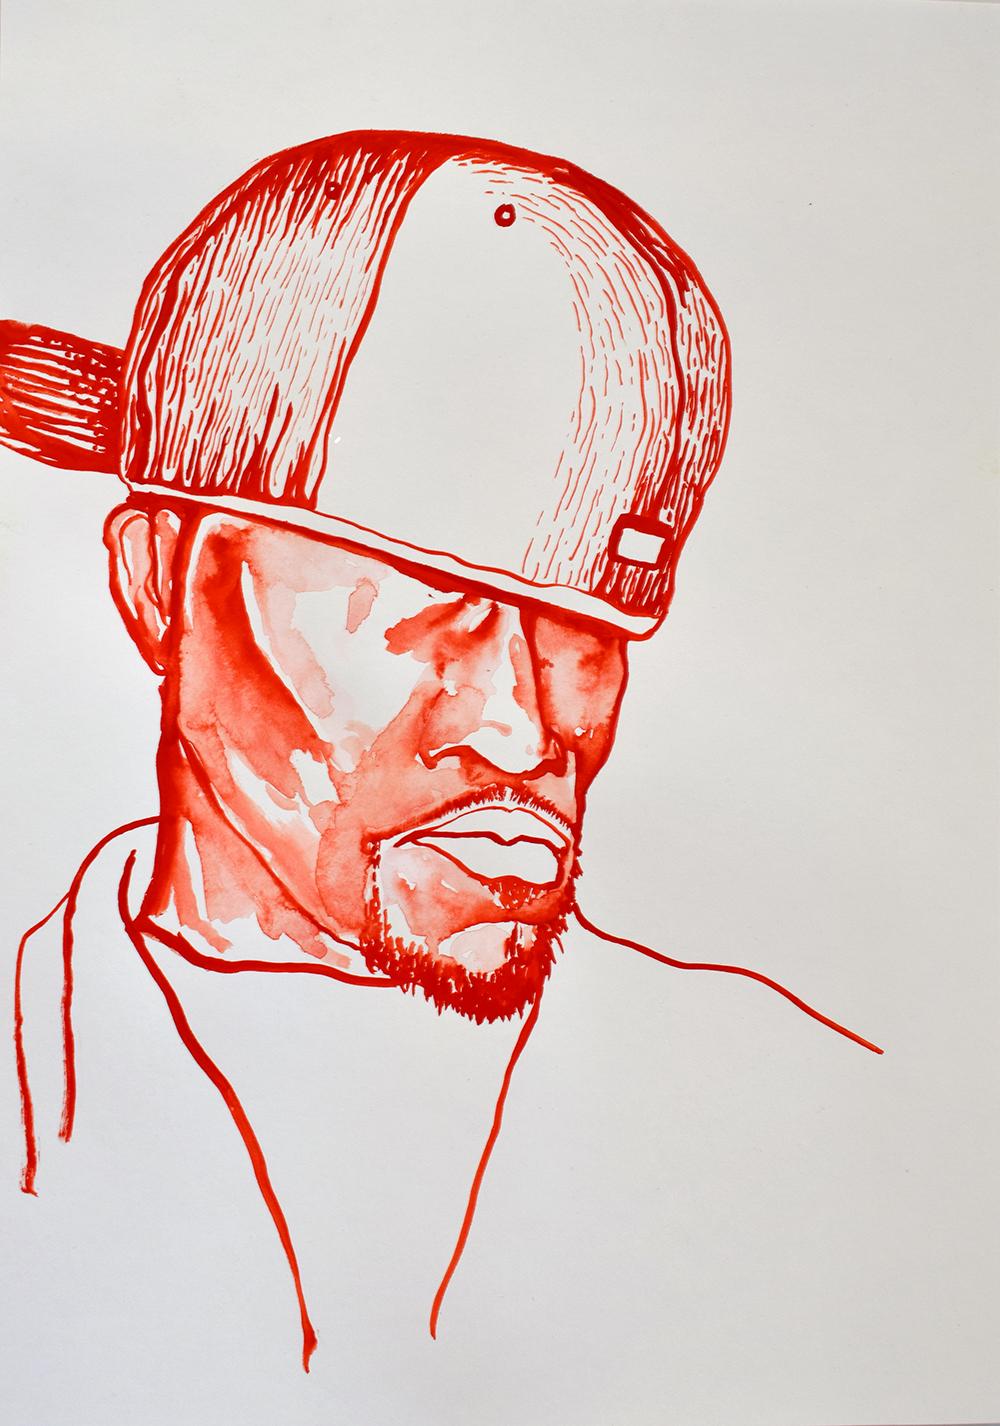 `Redman', 29.7 x 42.0cm, watercolour on 230g akvarel paper, 2017